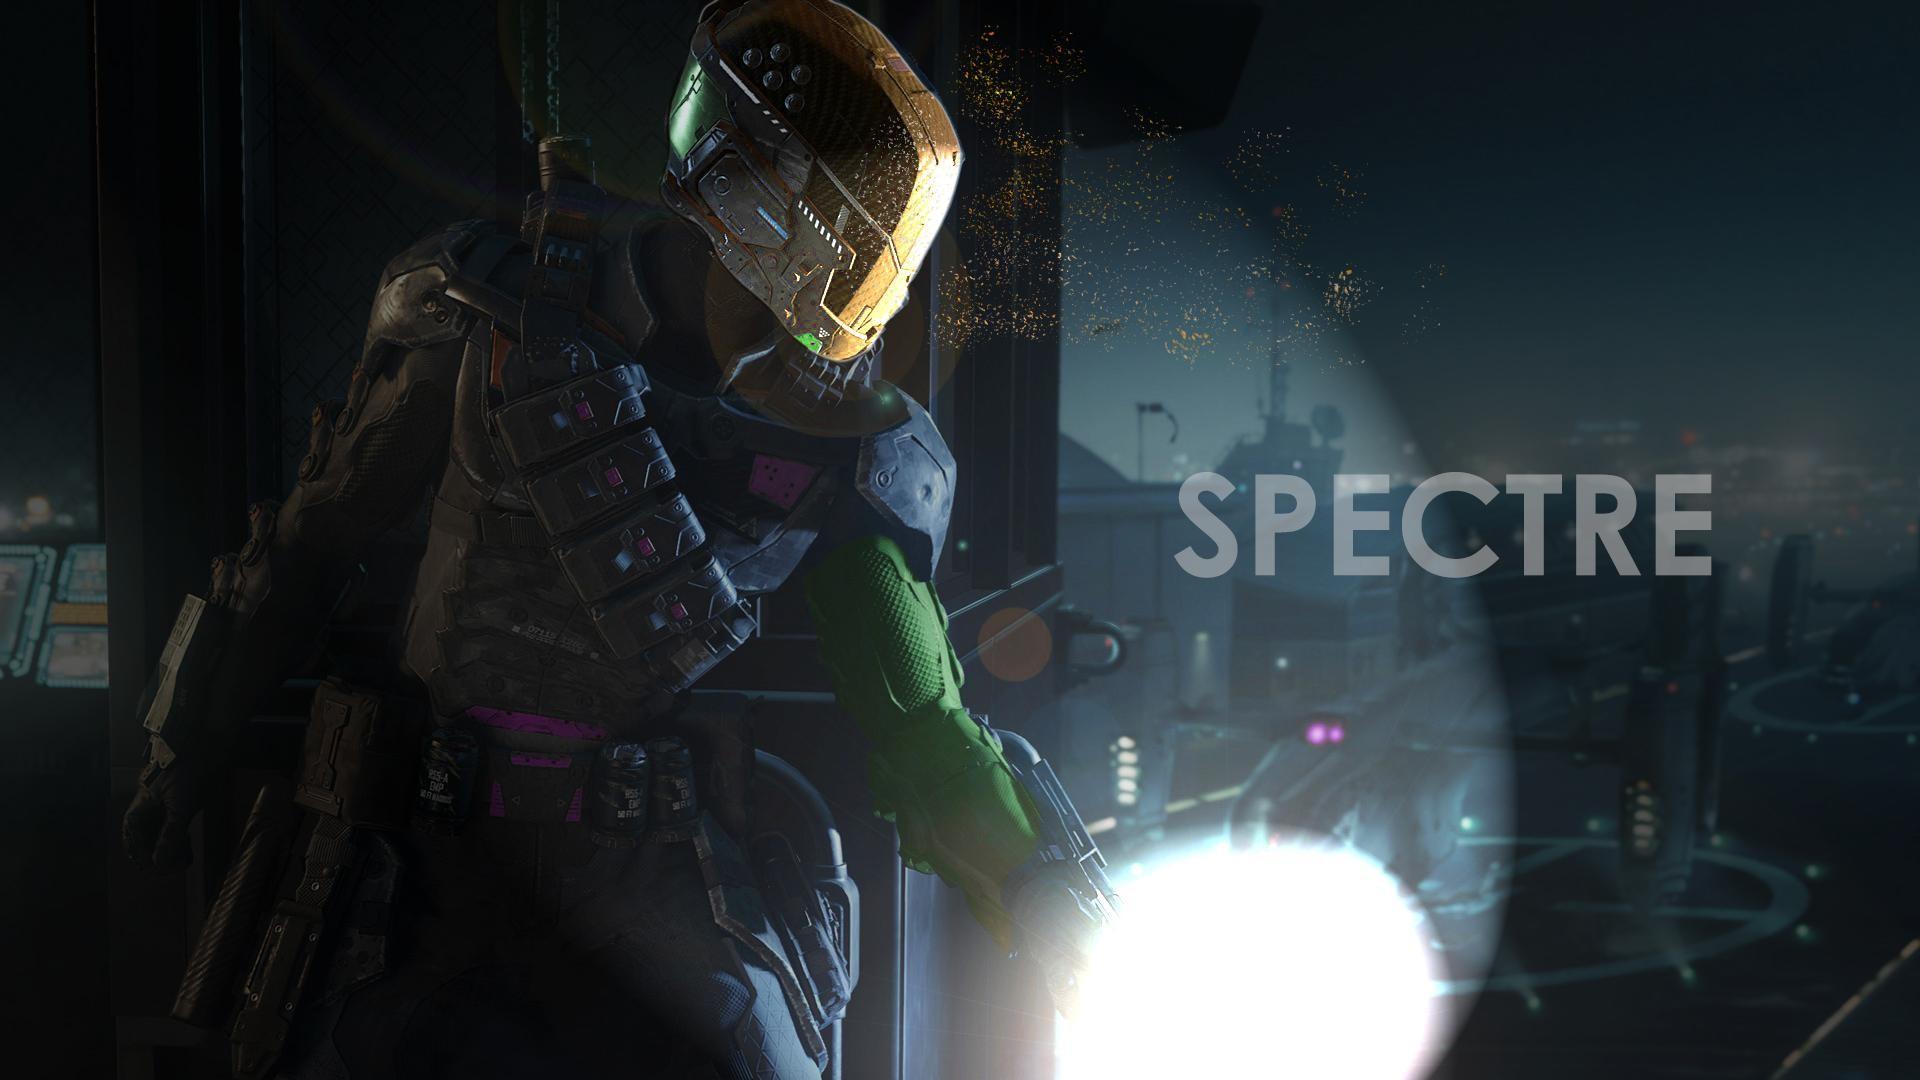 ImageUsing Photoshop on Spectre …